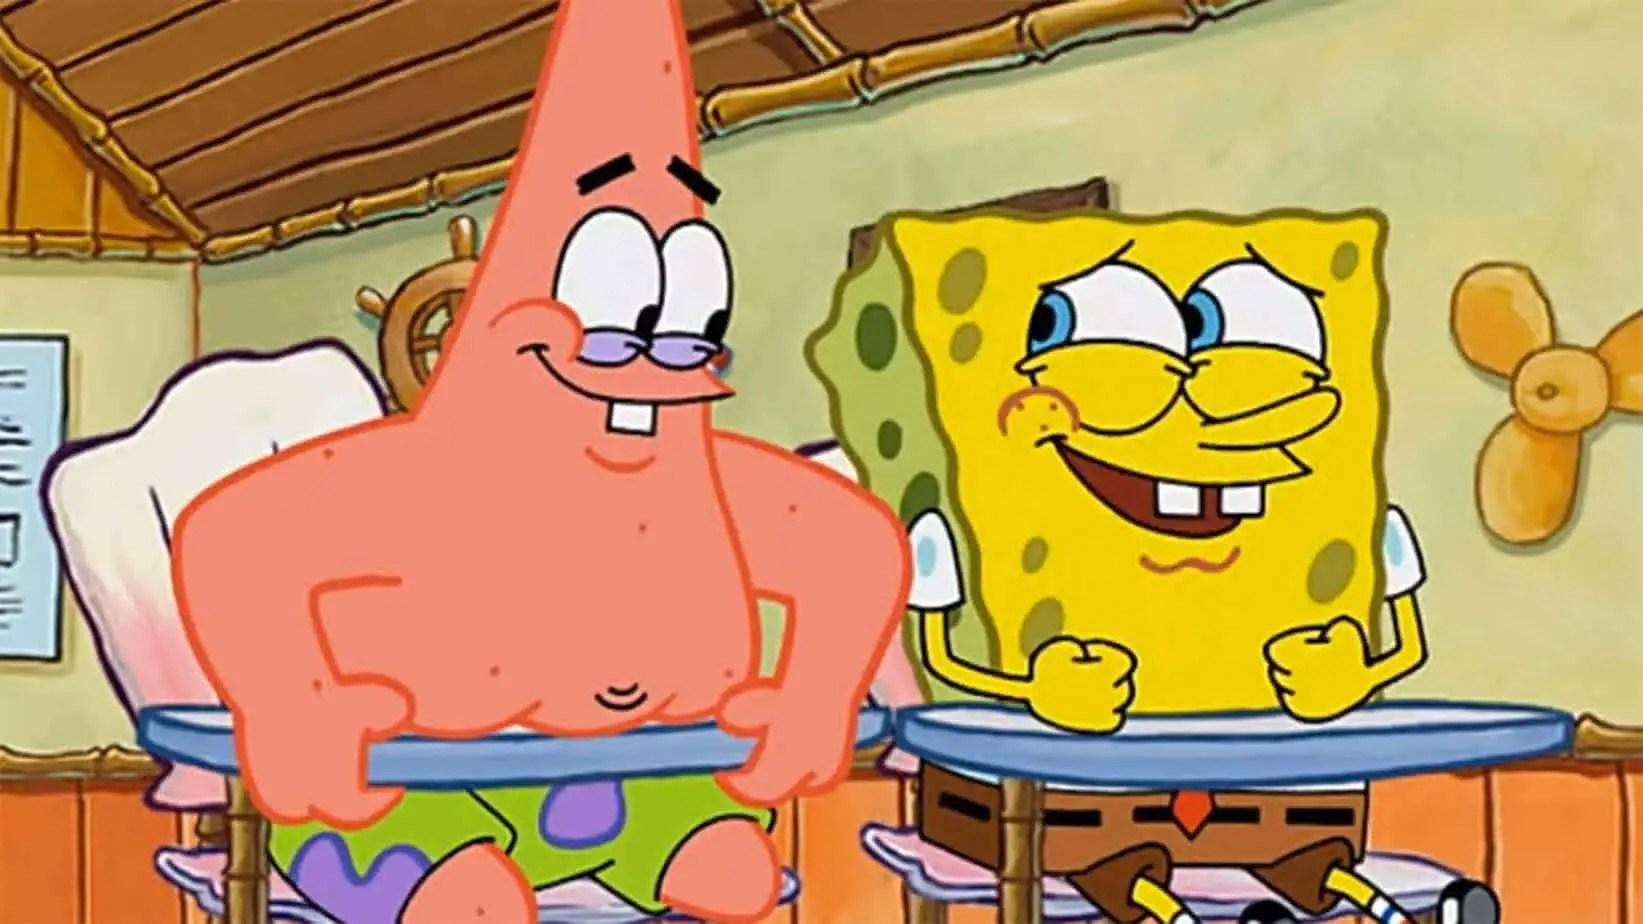 Humour Writing And Spongebob Squarepants - Slap Happy Larry